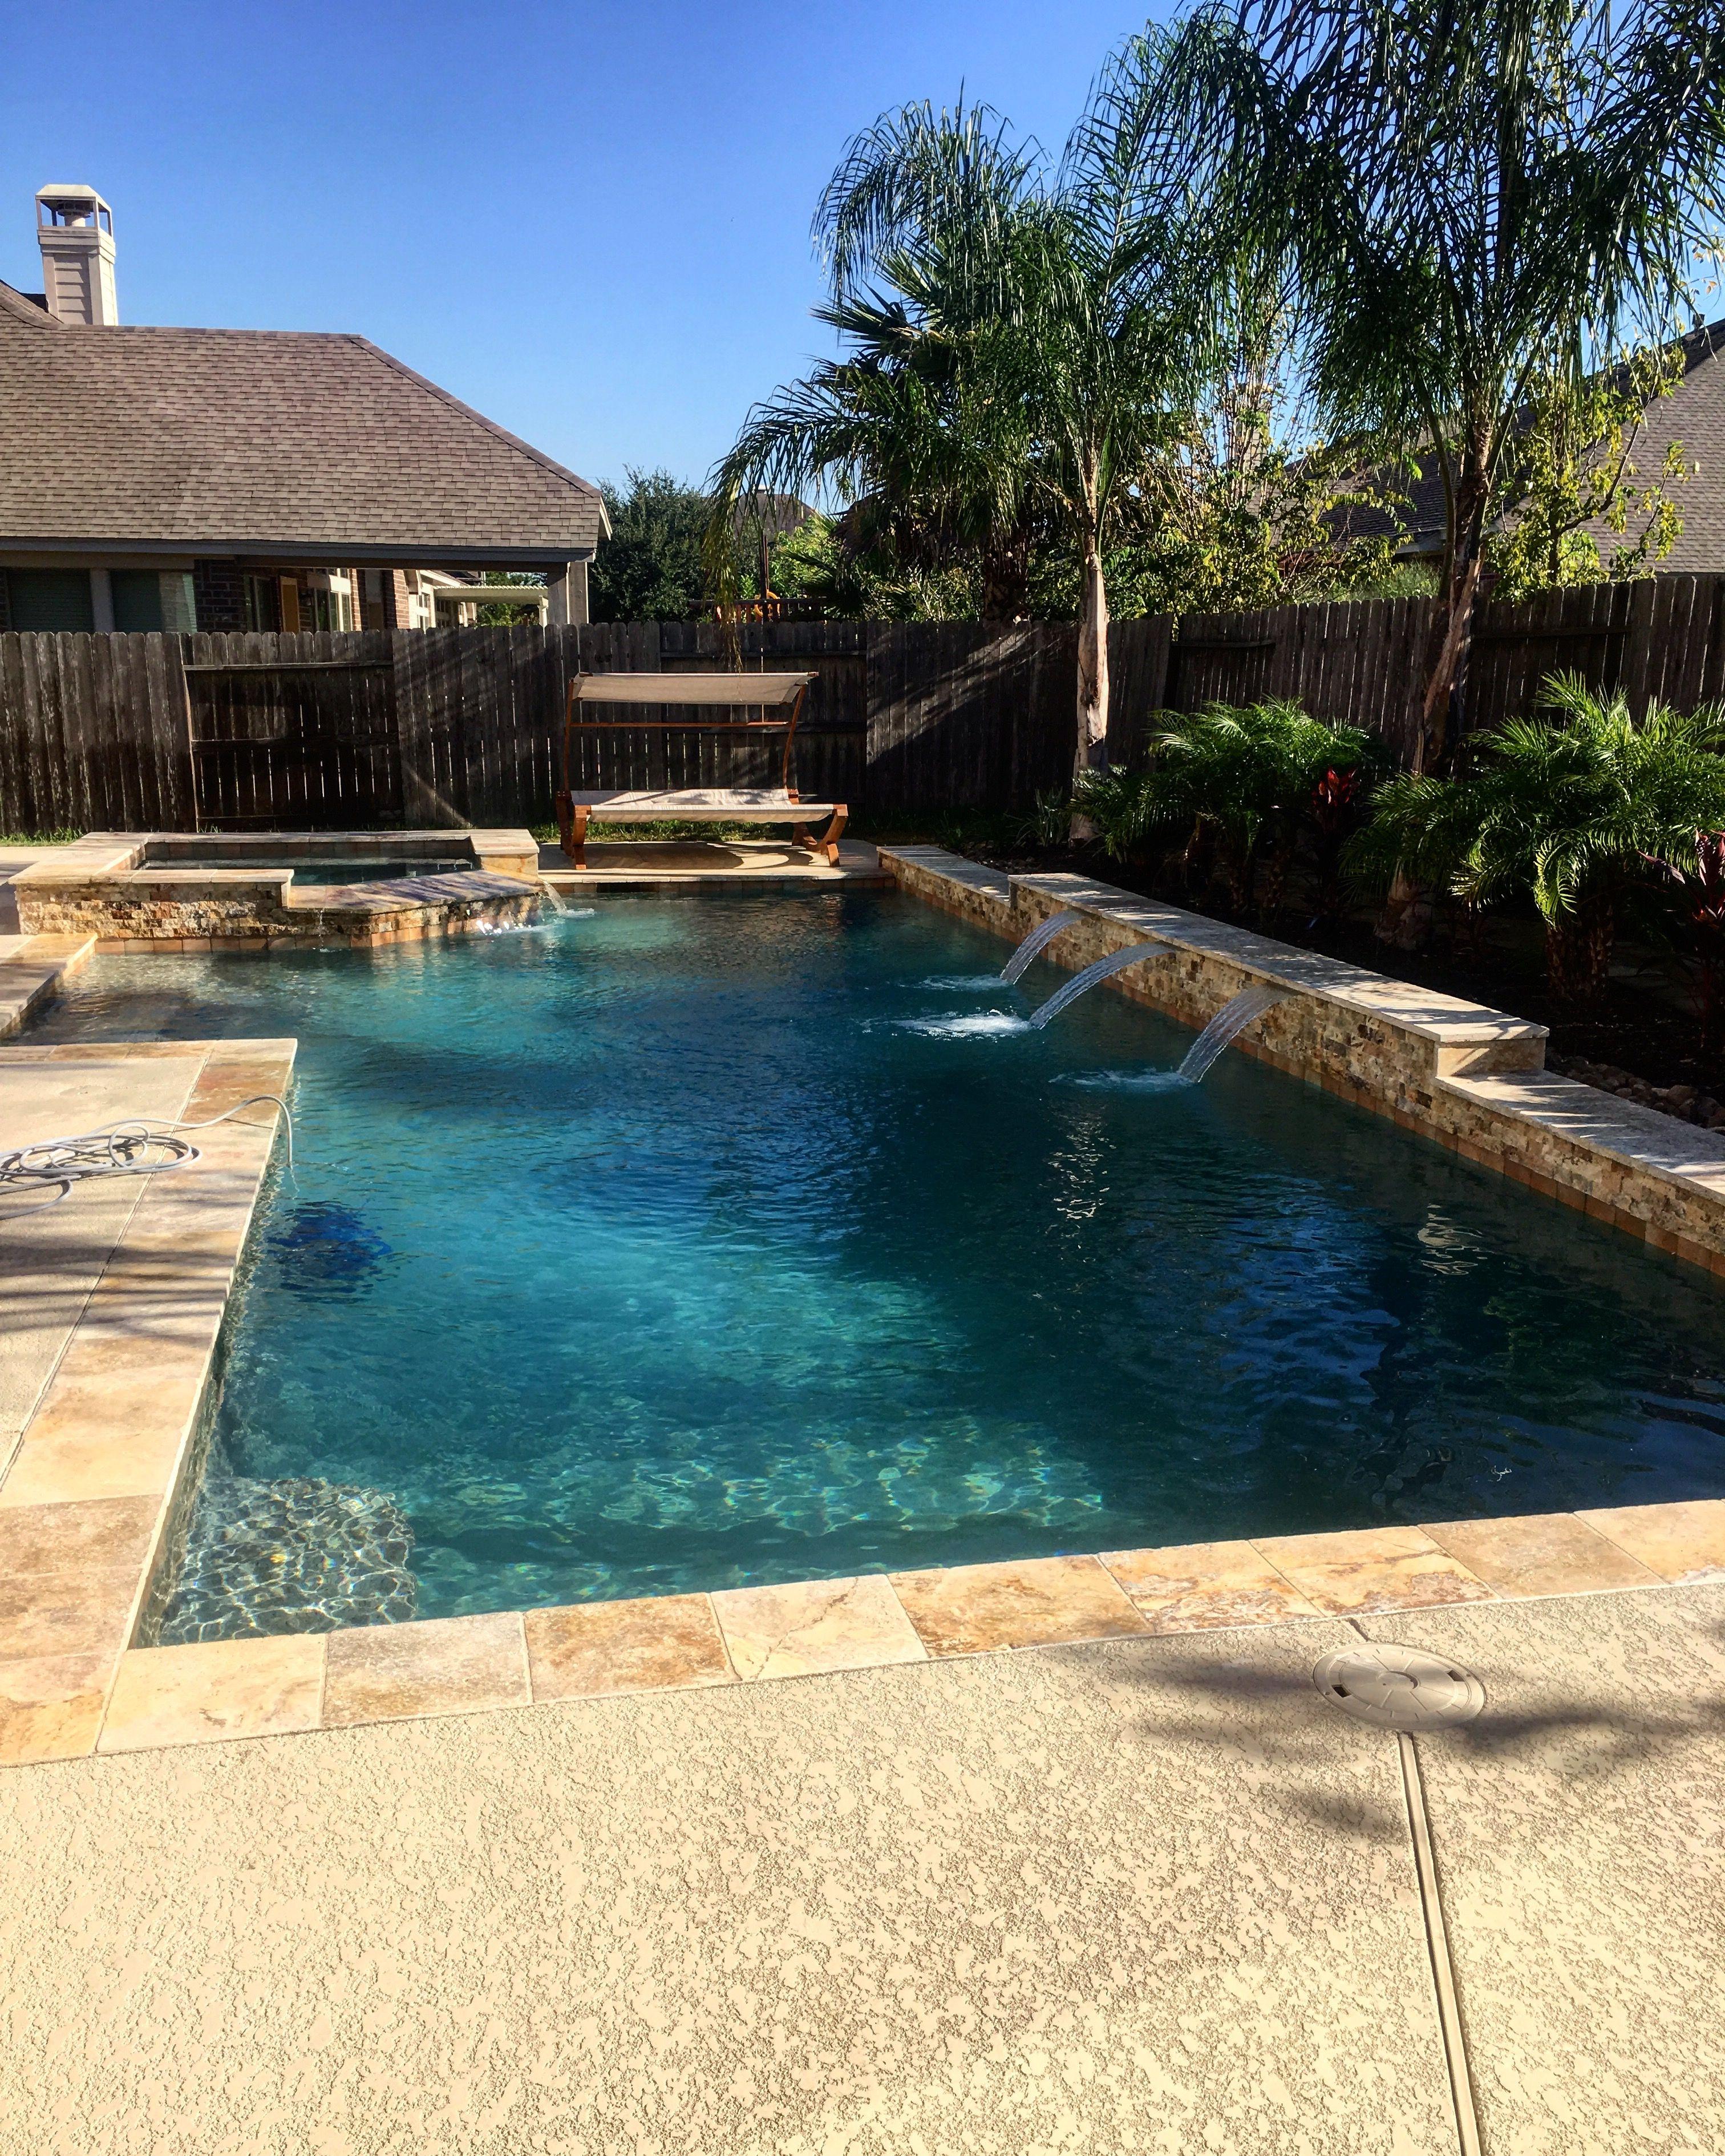 Geometric Pools And Spa! Scabos Travertine! #custompools #pooldesigns  Designer: Kyle Franco